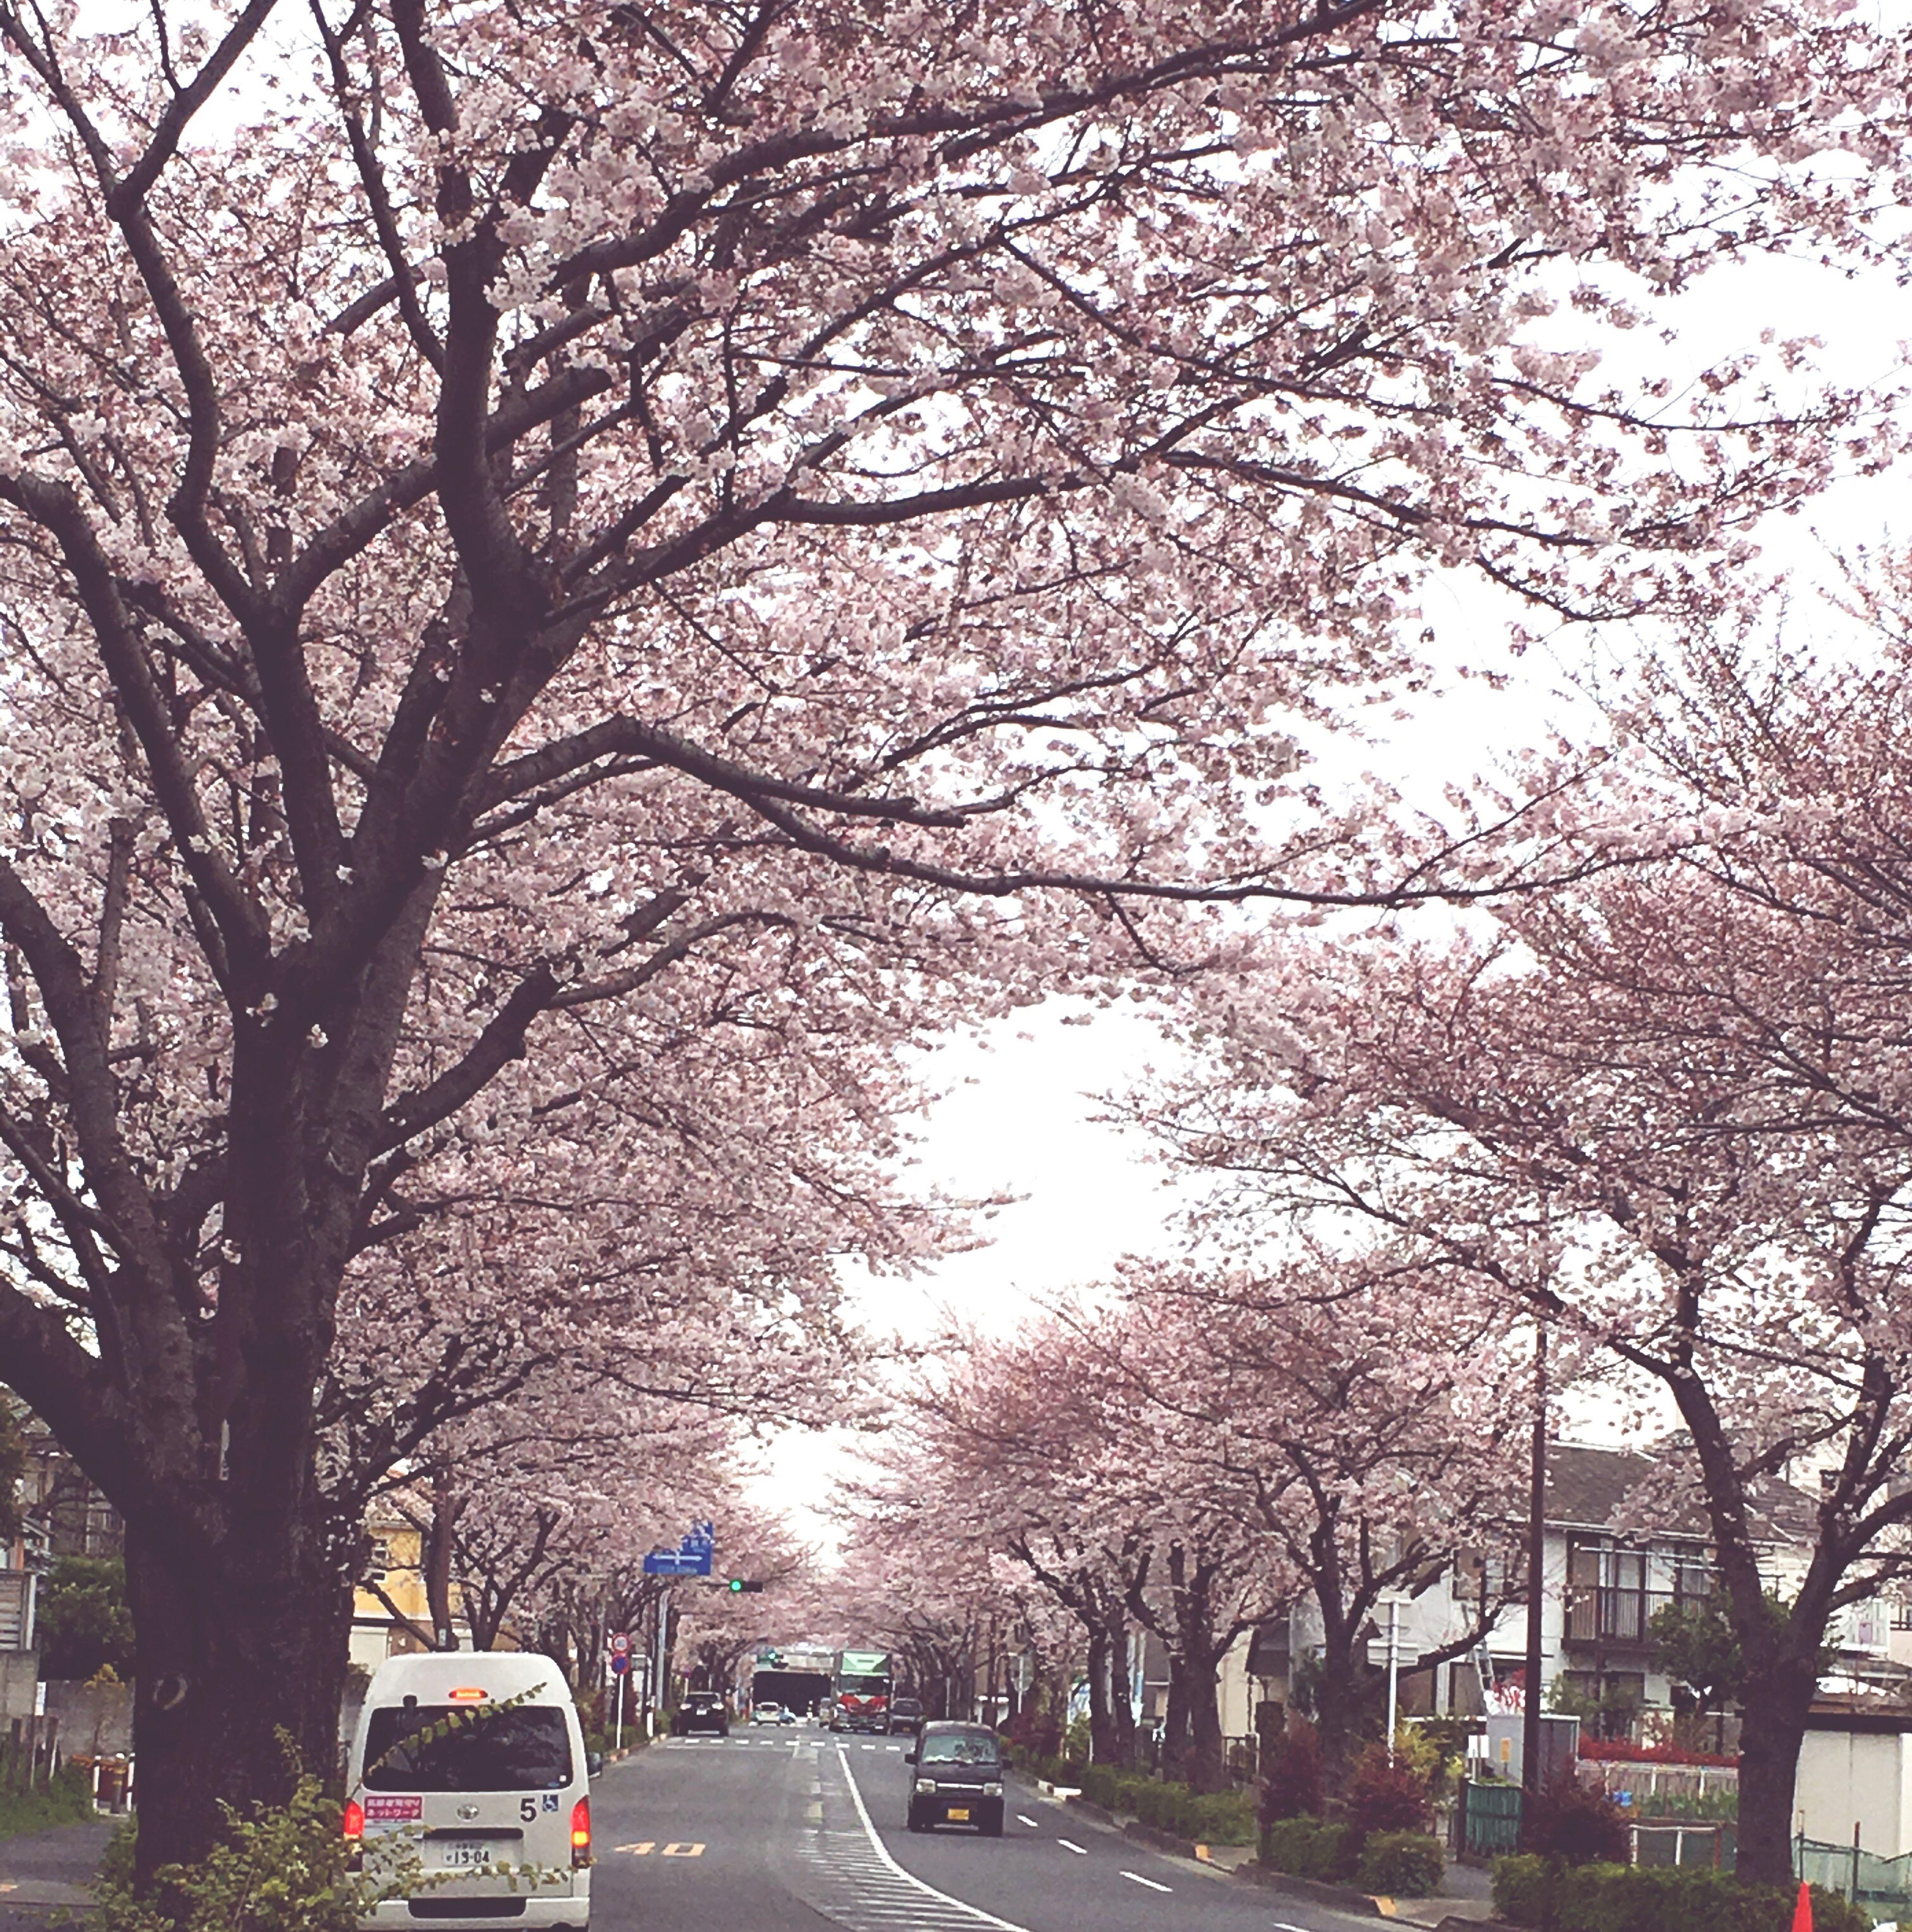 Cherry Blossoms Enjoying Life Still More Rord Row Of Cherry Blossom Trees Spring